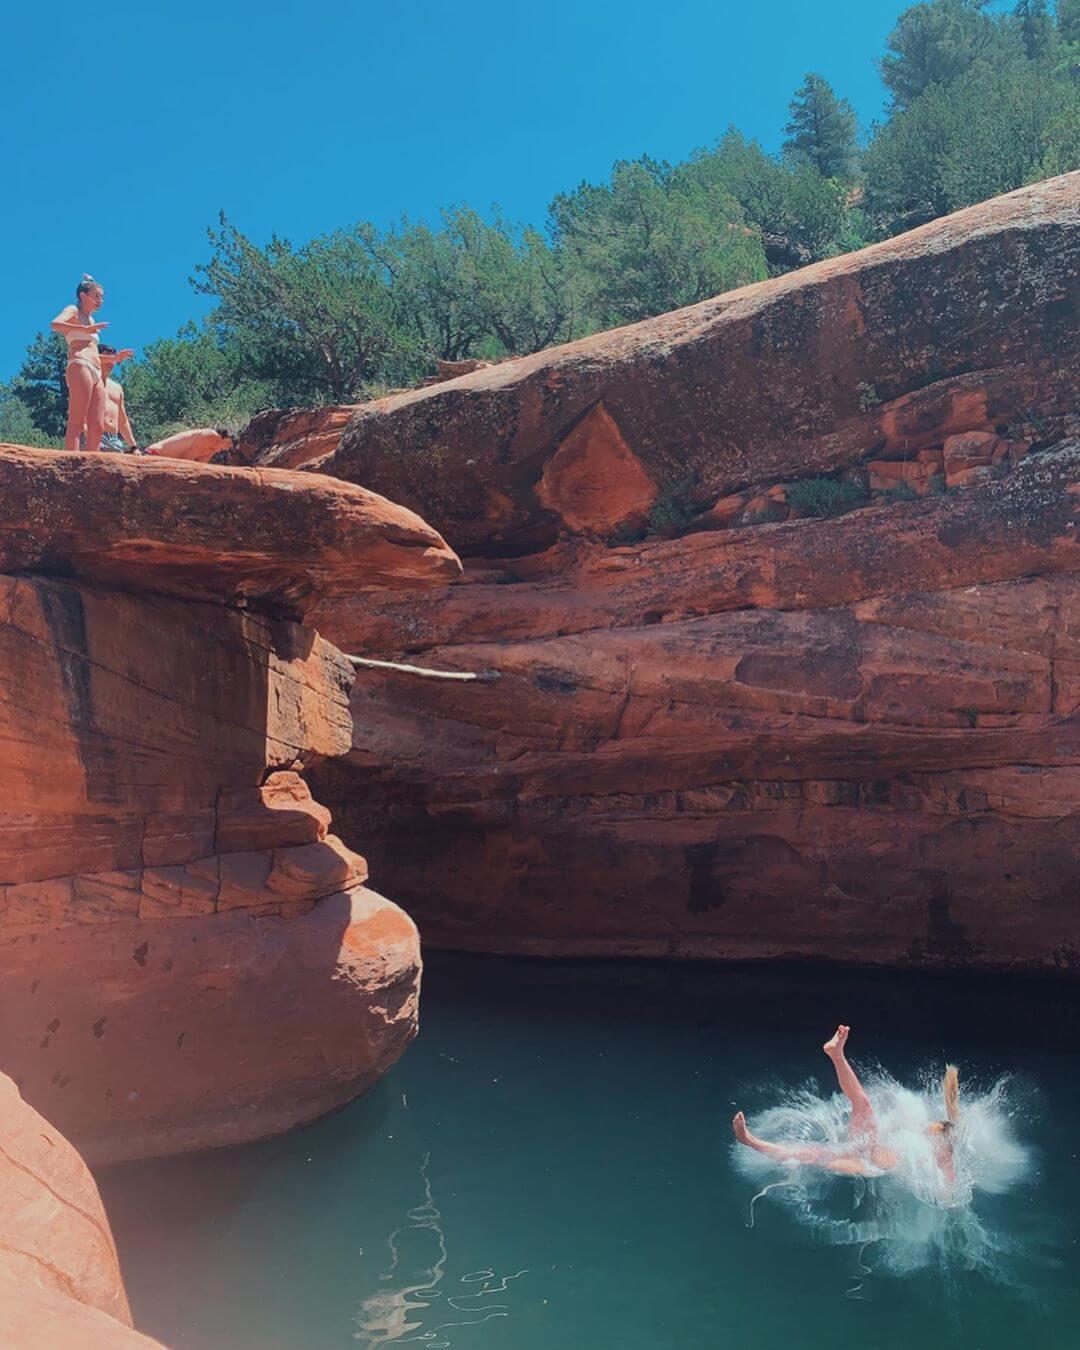 creeks in arizona hidden gems